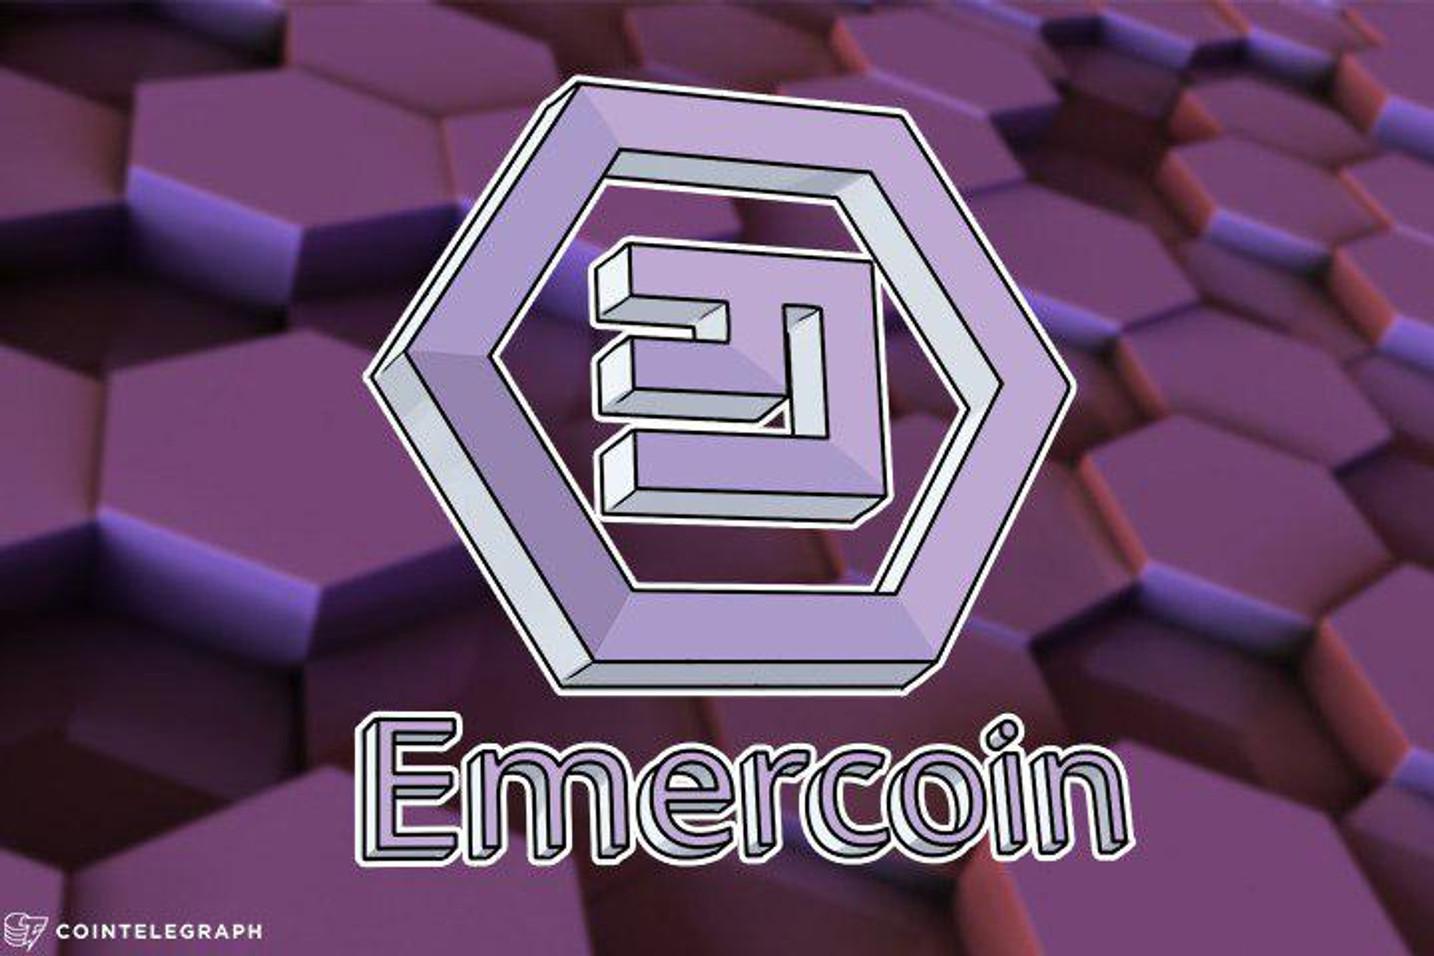 IT-Farm Corporation Makes Strategic Investment In Emercoin Blockchain